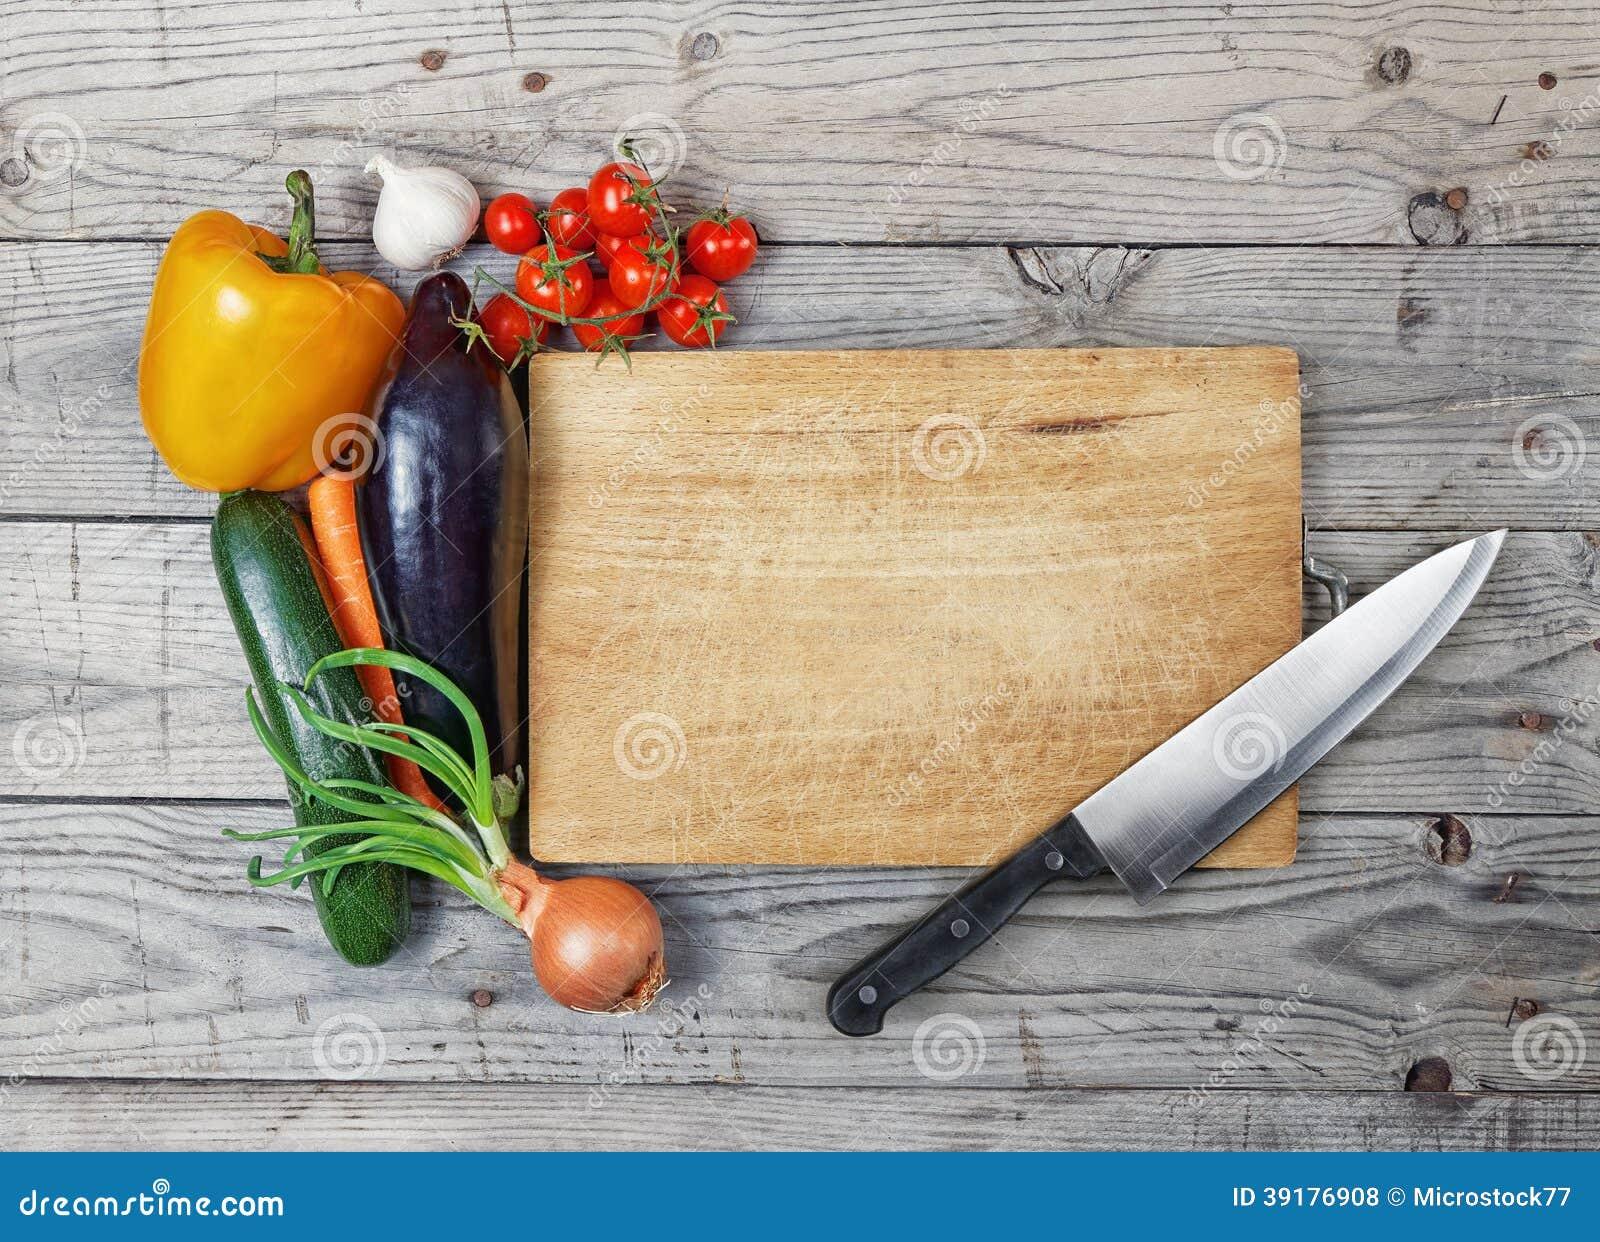 Board cooking ingredient knife